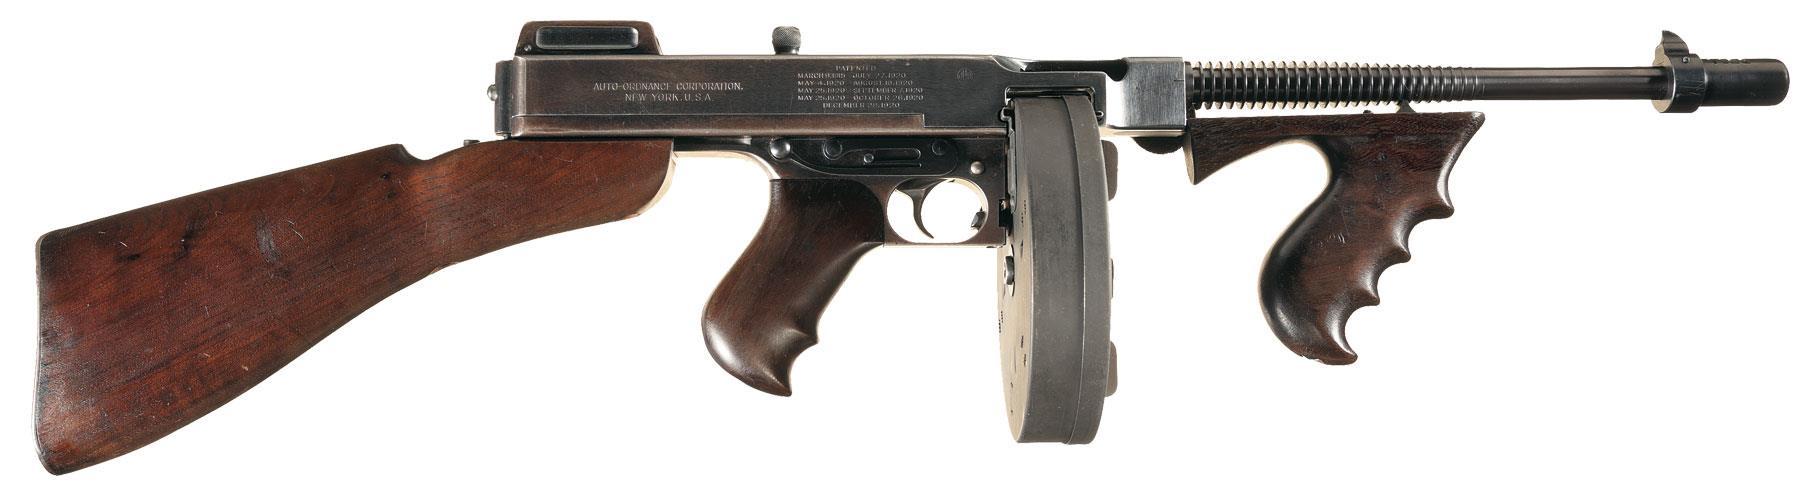 ww2 thompson machine gun for sale